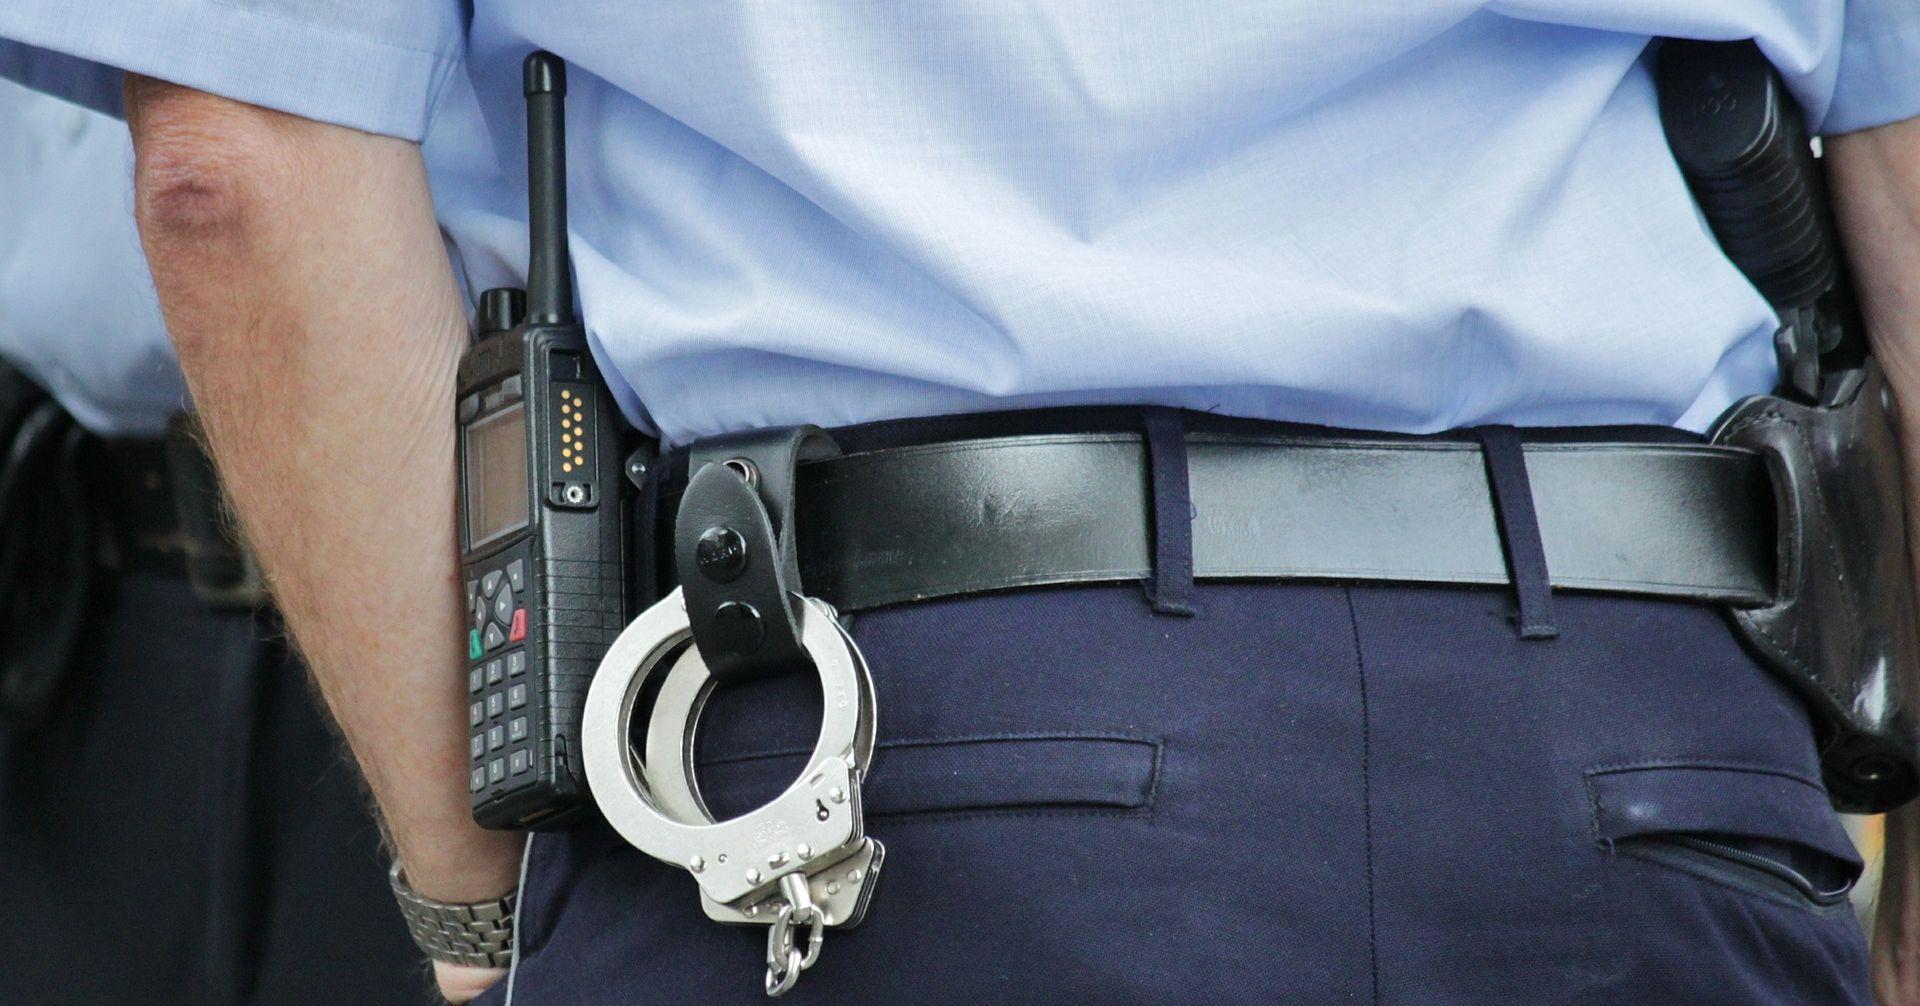 'NESTAŠLUK' NA TWITTERU Britanska policija Rooneyja proglasila nestalim, pa se narugala Sunderlandu